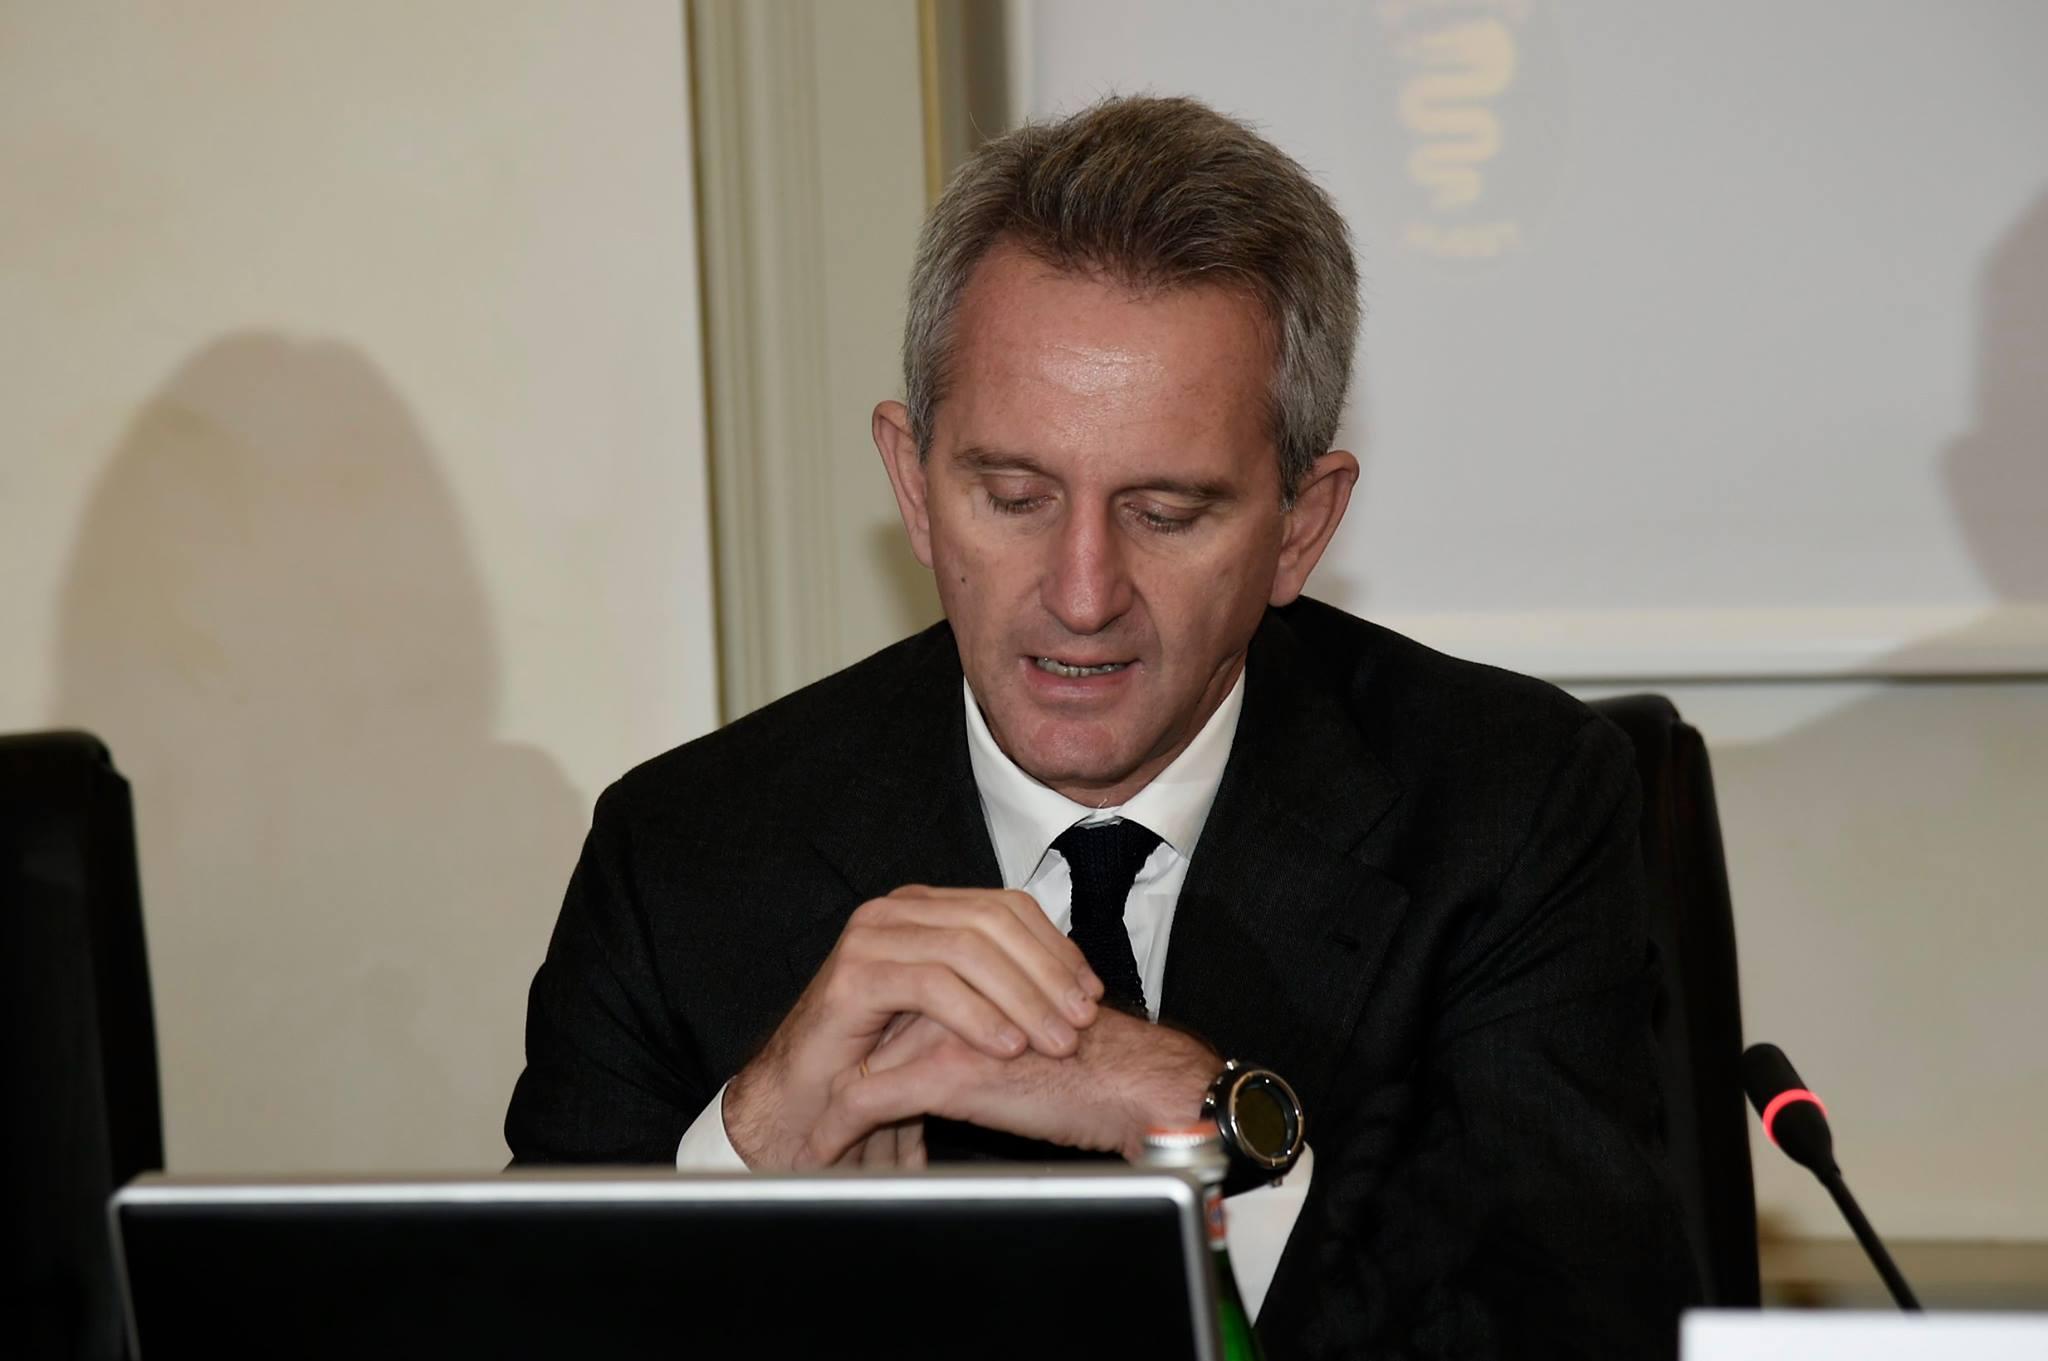 Mediobanca婚禮Bper-Banco Bpm的見證人?